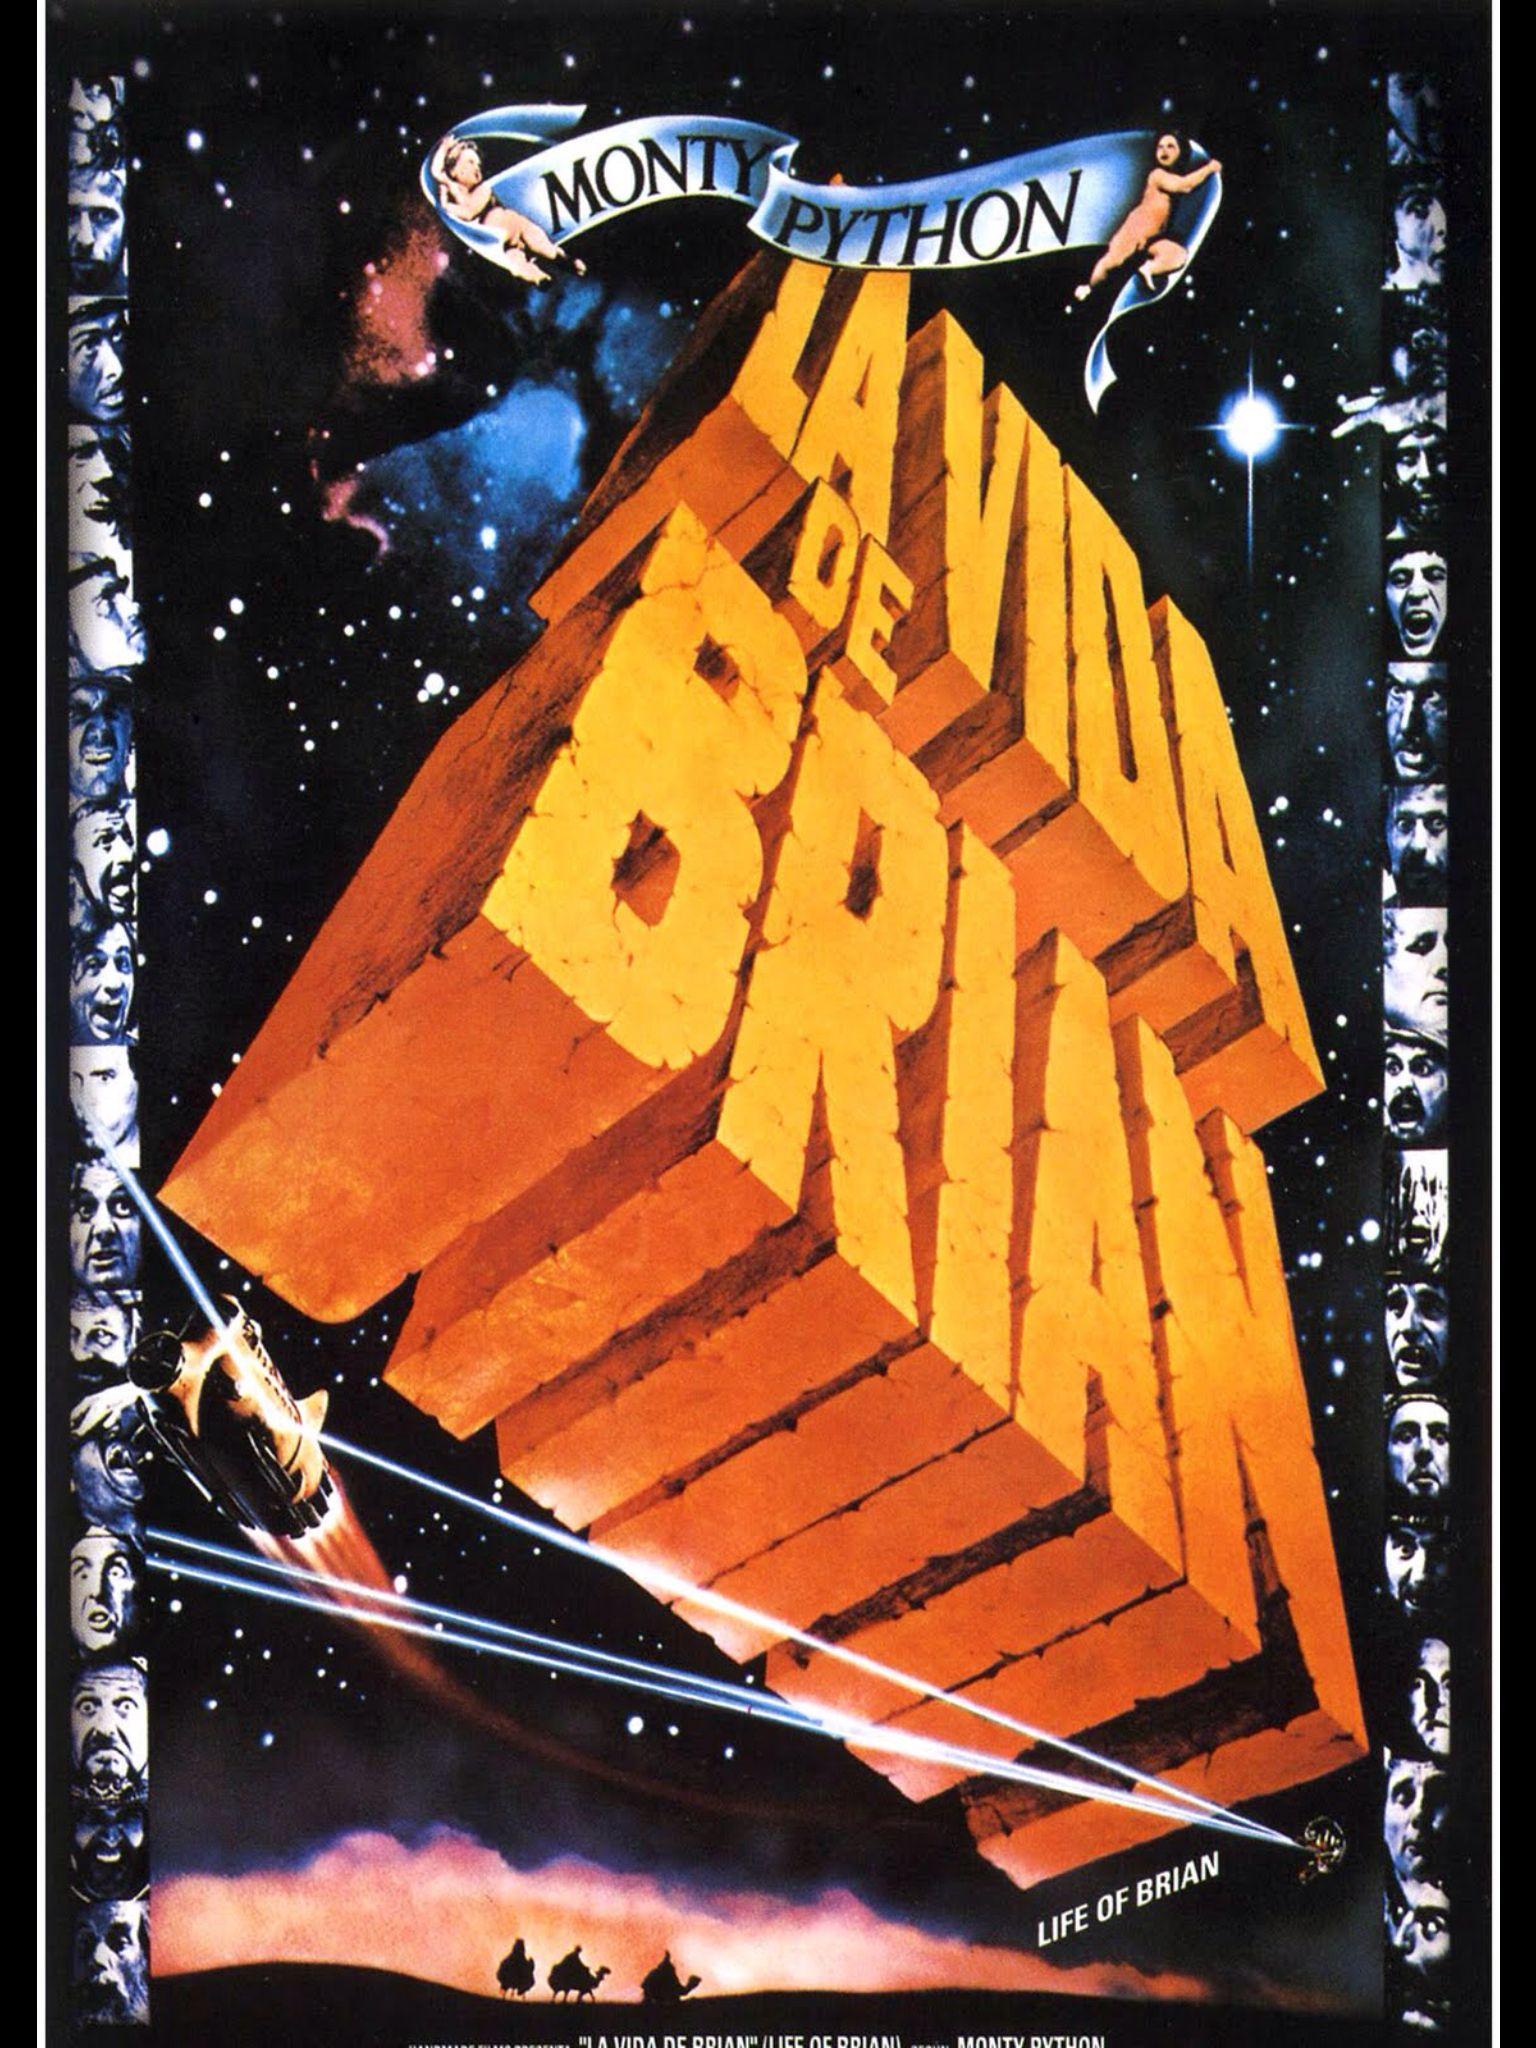 Life Of Brian Wallpaper